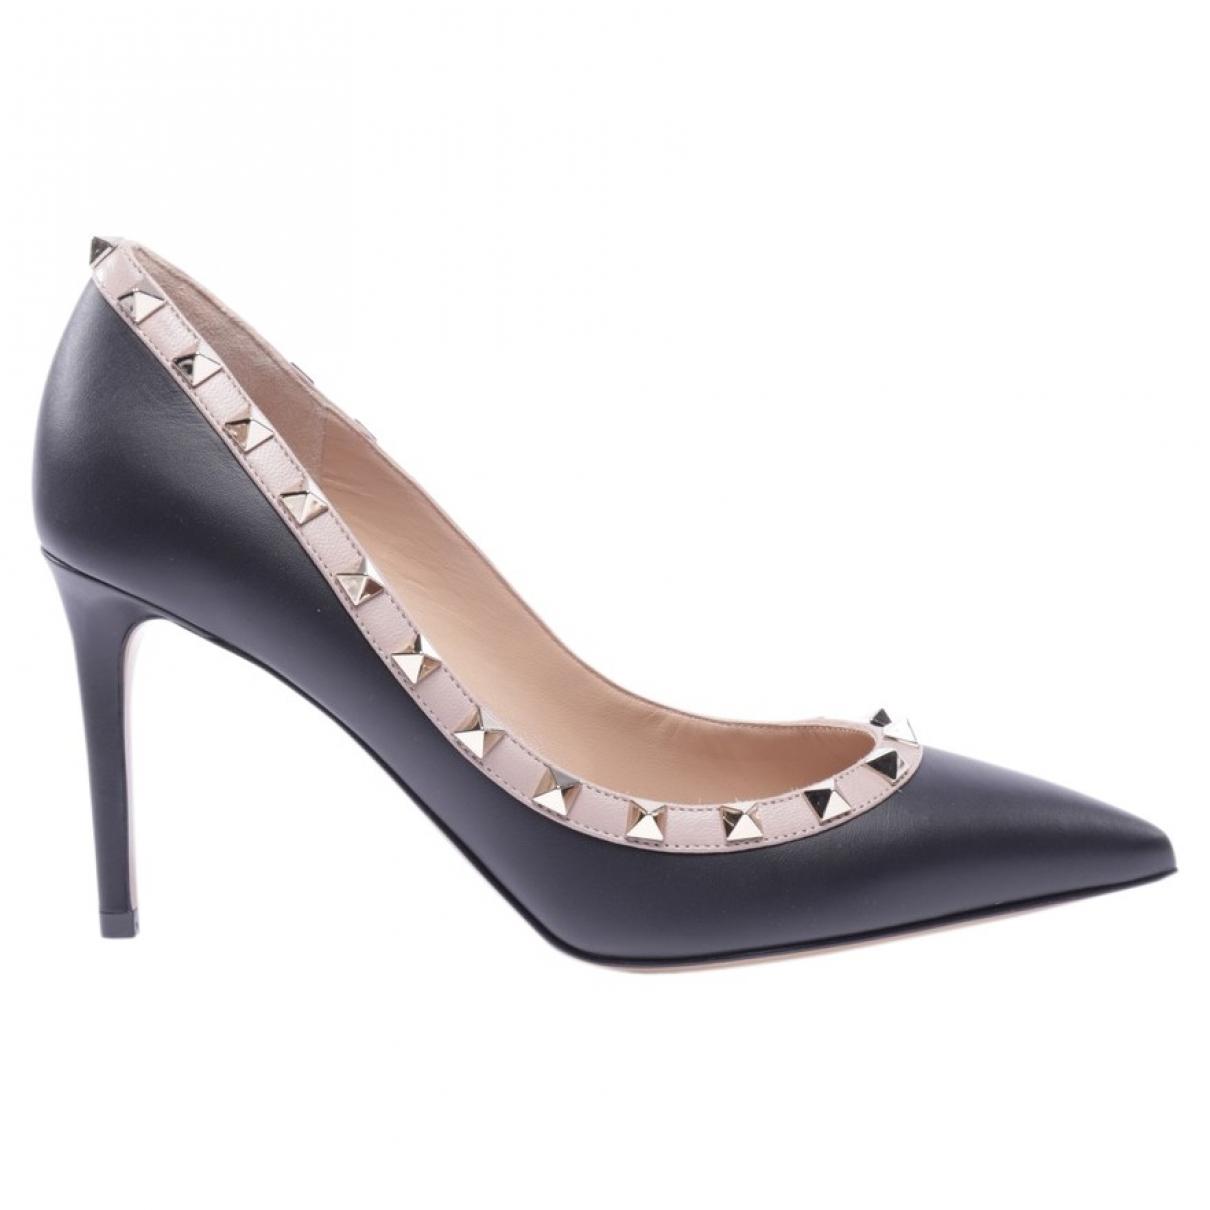 Valentino Garavani Rockstud Black Leather Heels for Women 38.5 EU